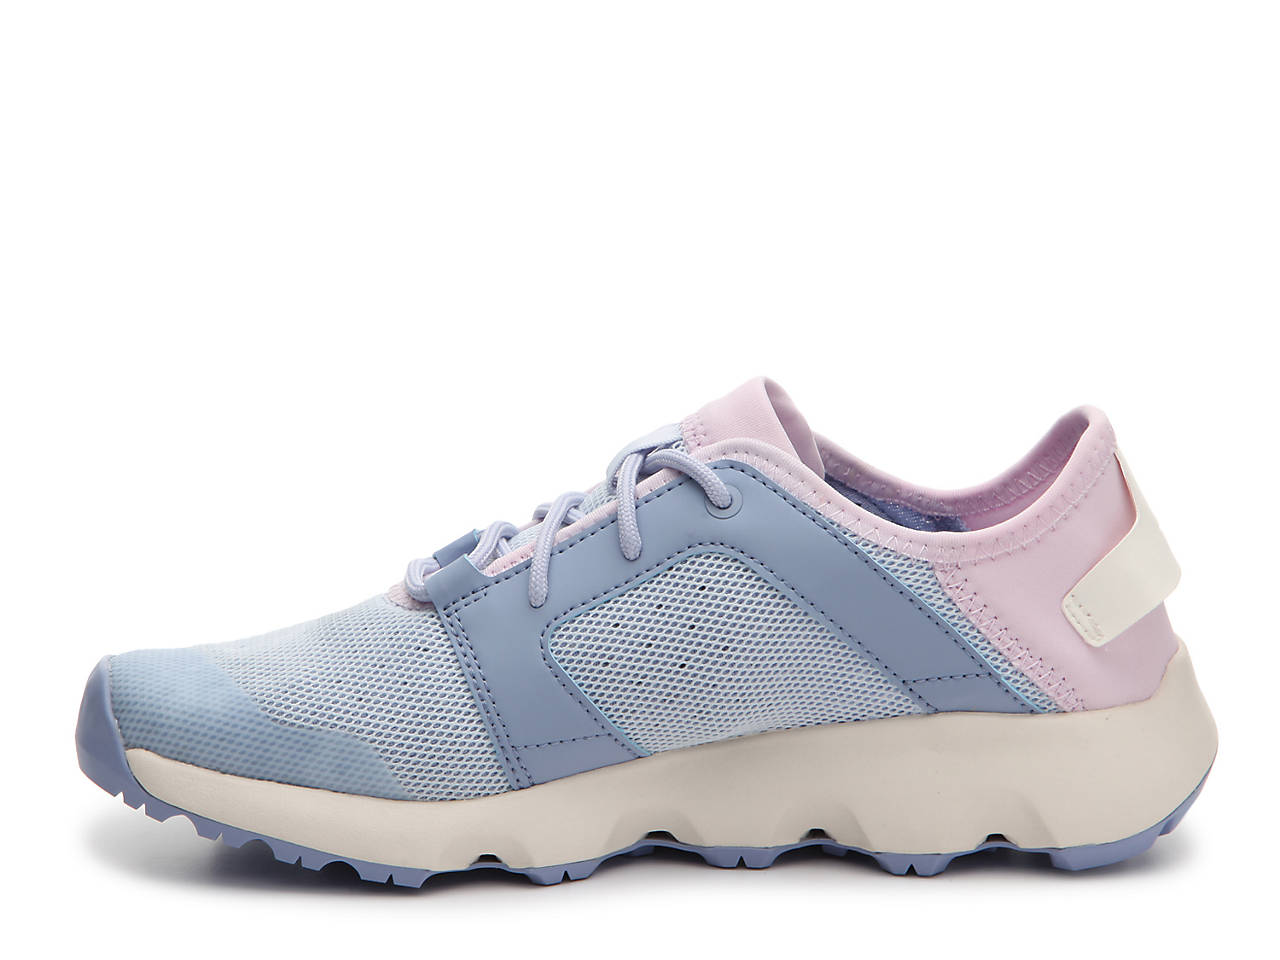 adidas terrex voyager tracce scarpa scarpe da donna dsw